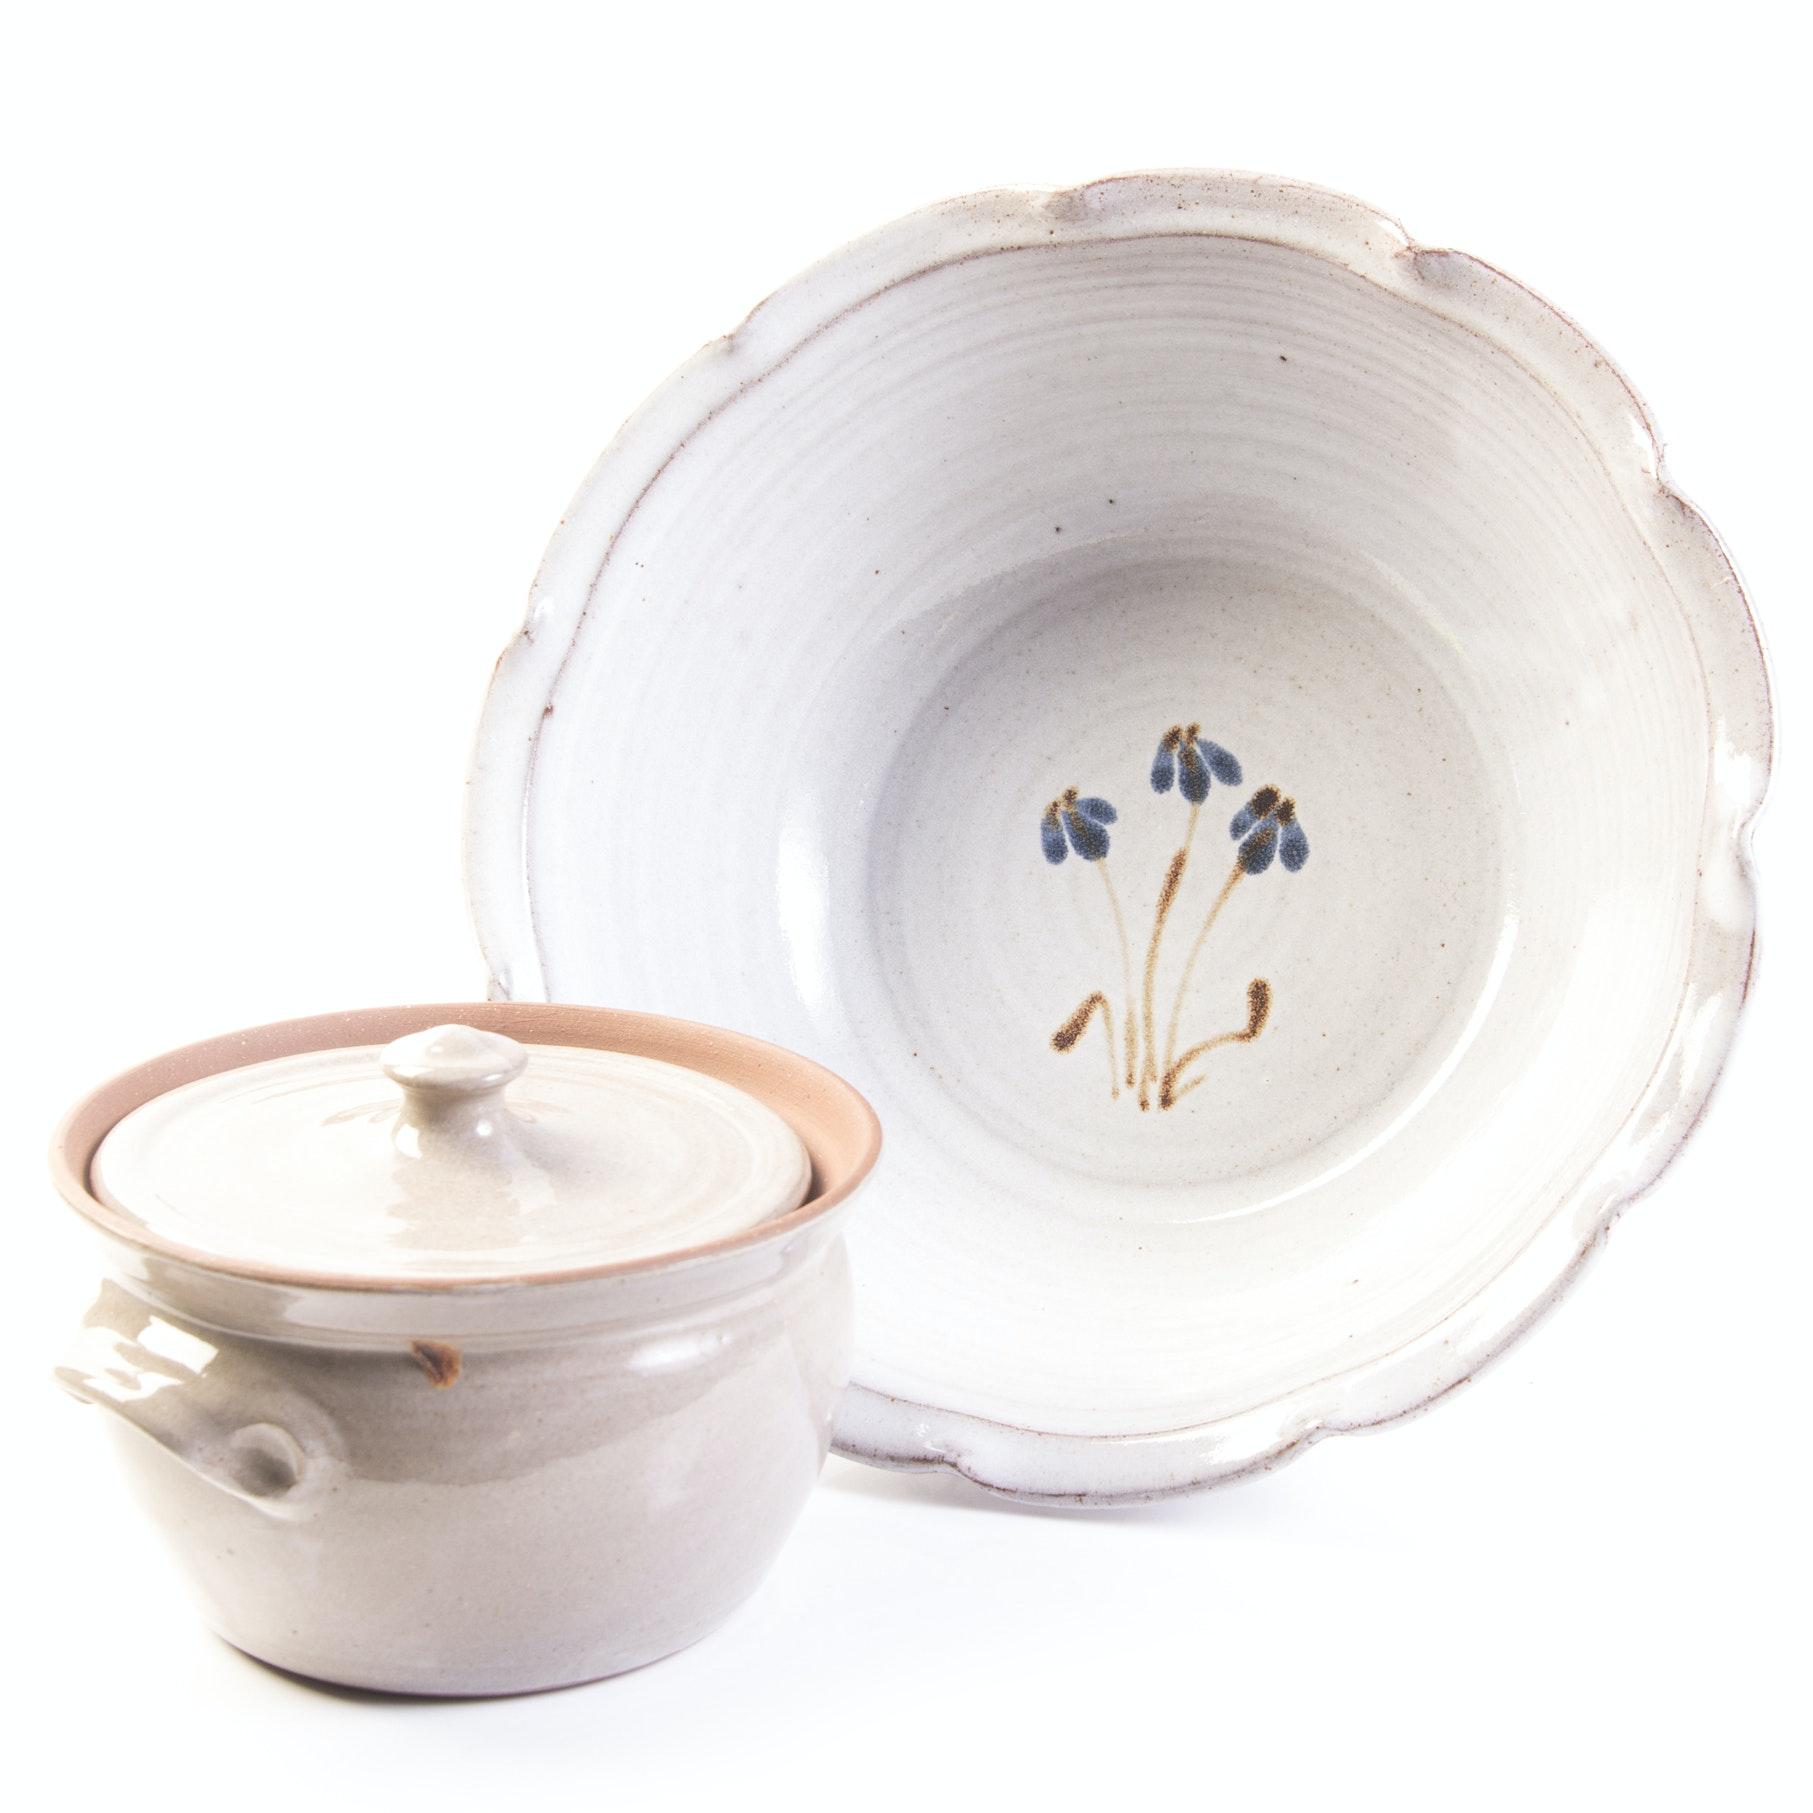 Hand Thrown Jugtownware Pottery Tableware